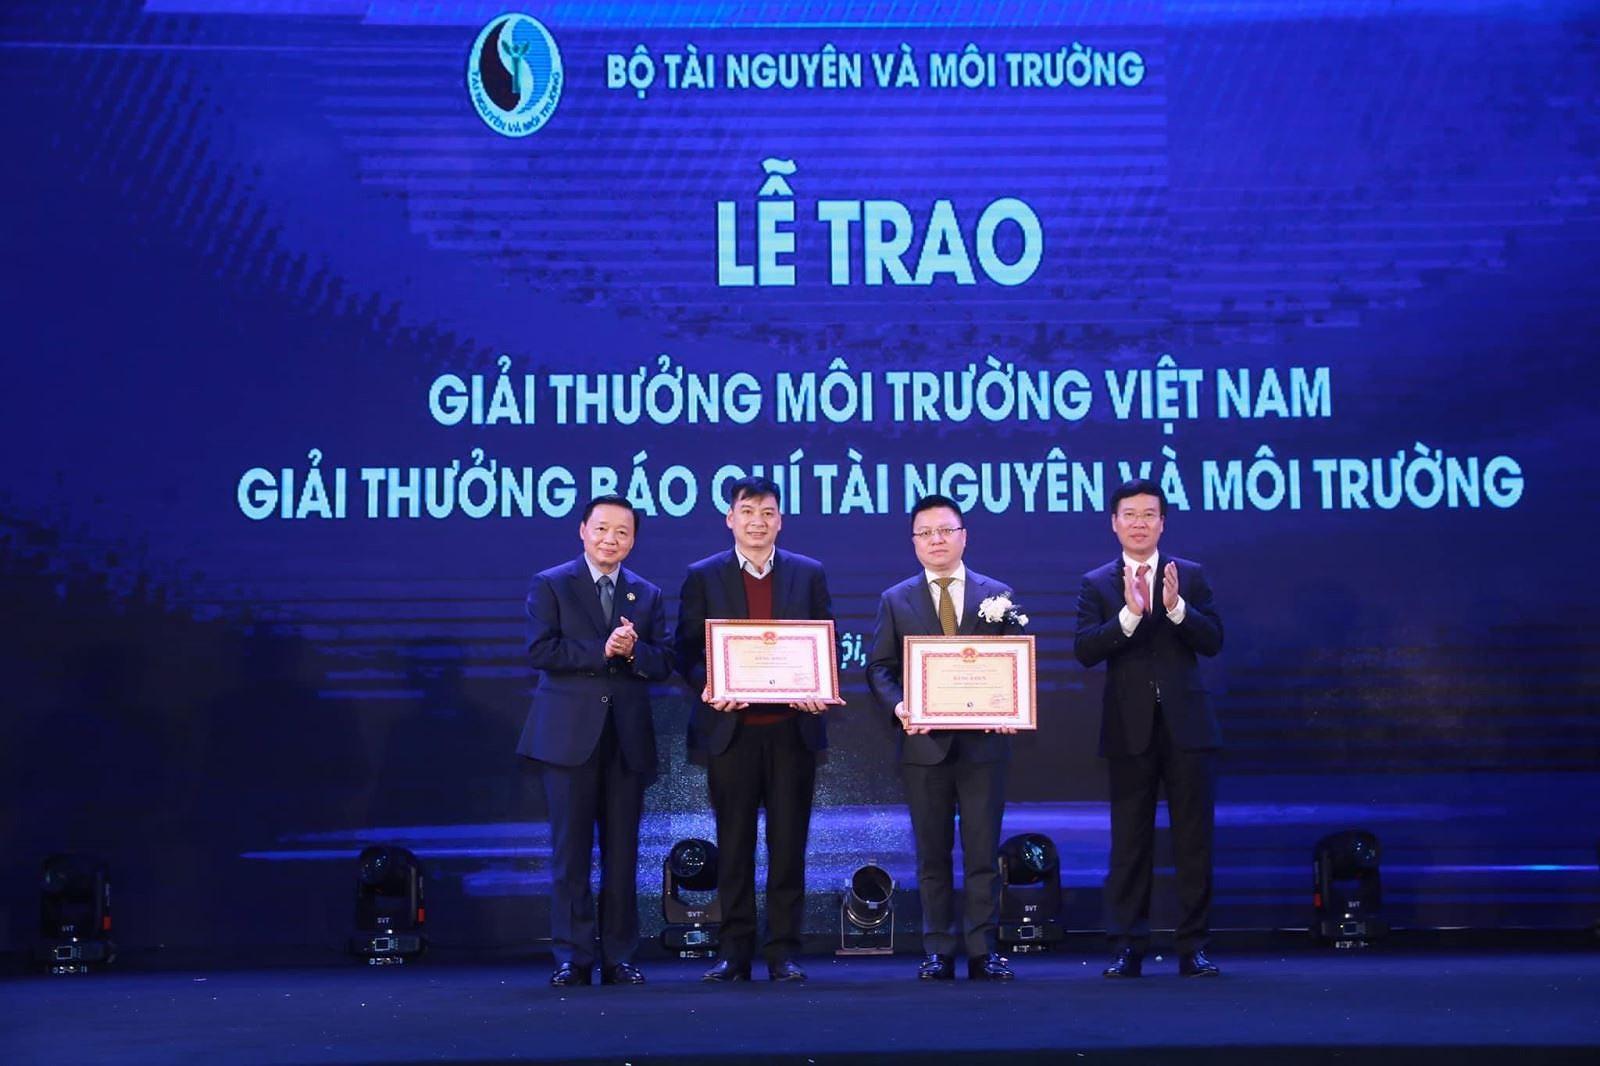 Bi thu Dang uy TTXVN Le Quoc Minh duoc tin nhiem bau vao BCH Trung uong Dang khoa XIII hinh anh 7